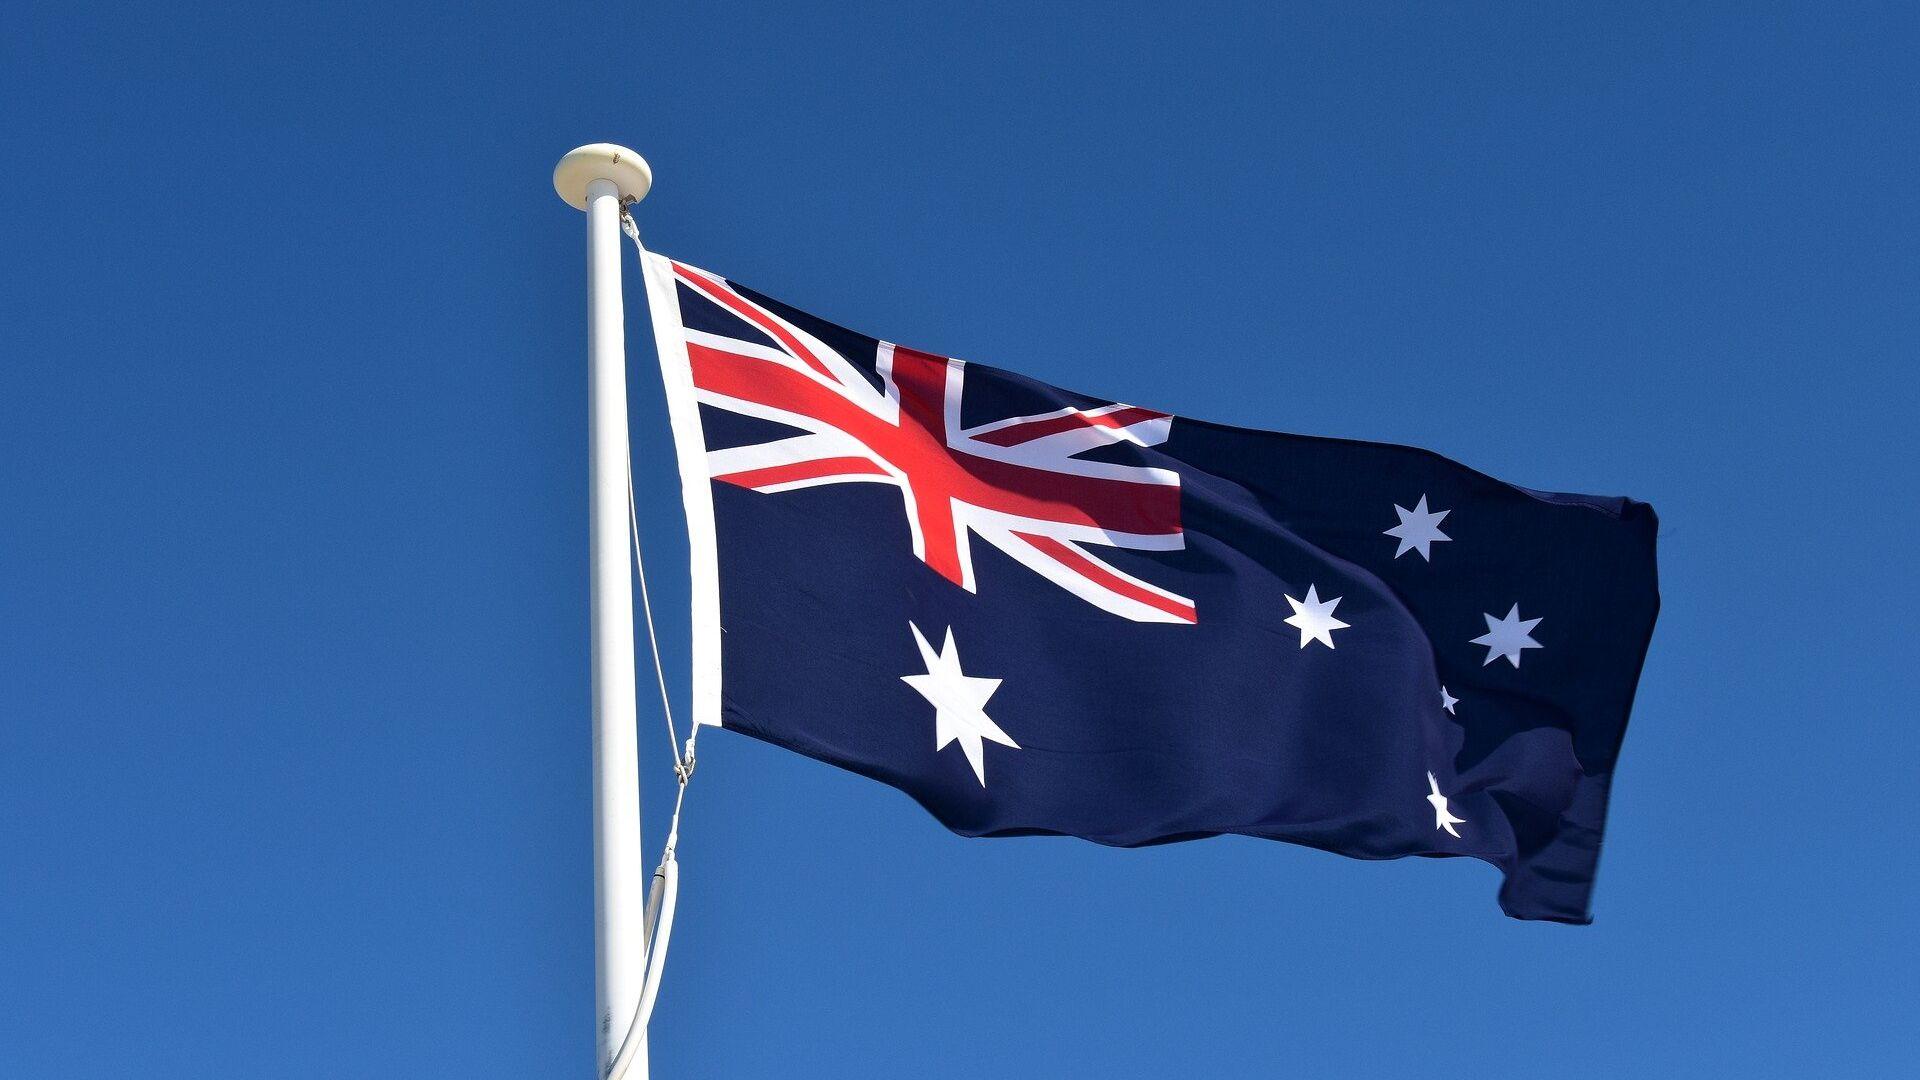 Australian flag - Sputnik International, 1920, 15.09.2021